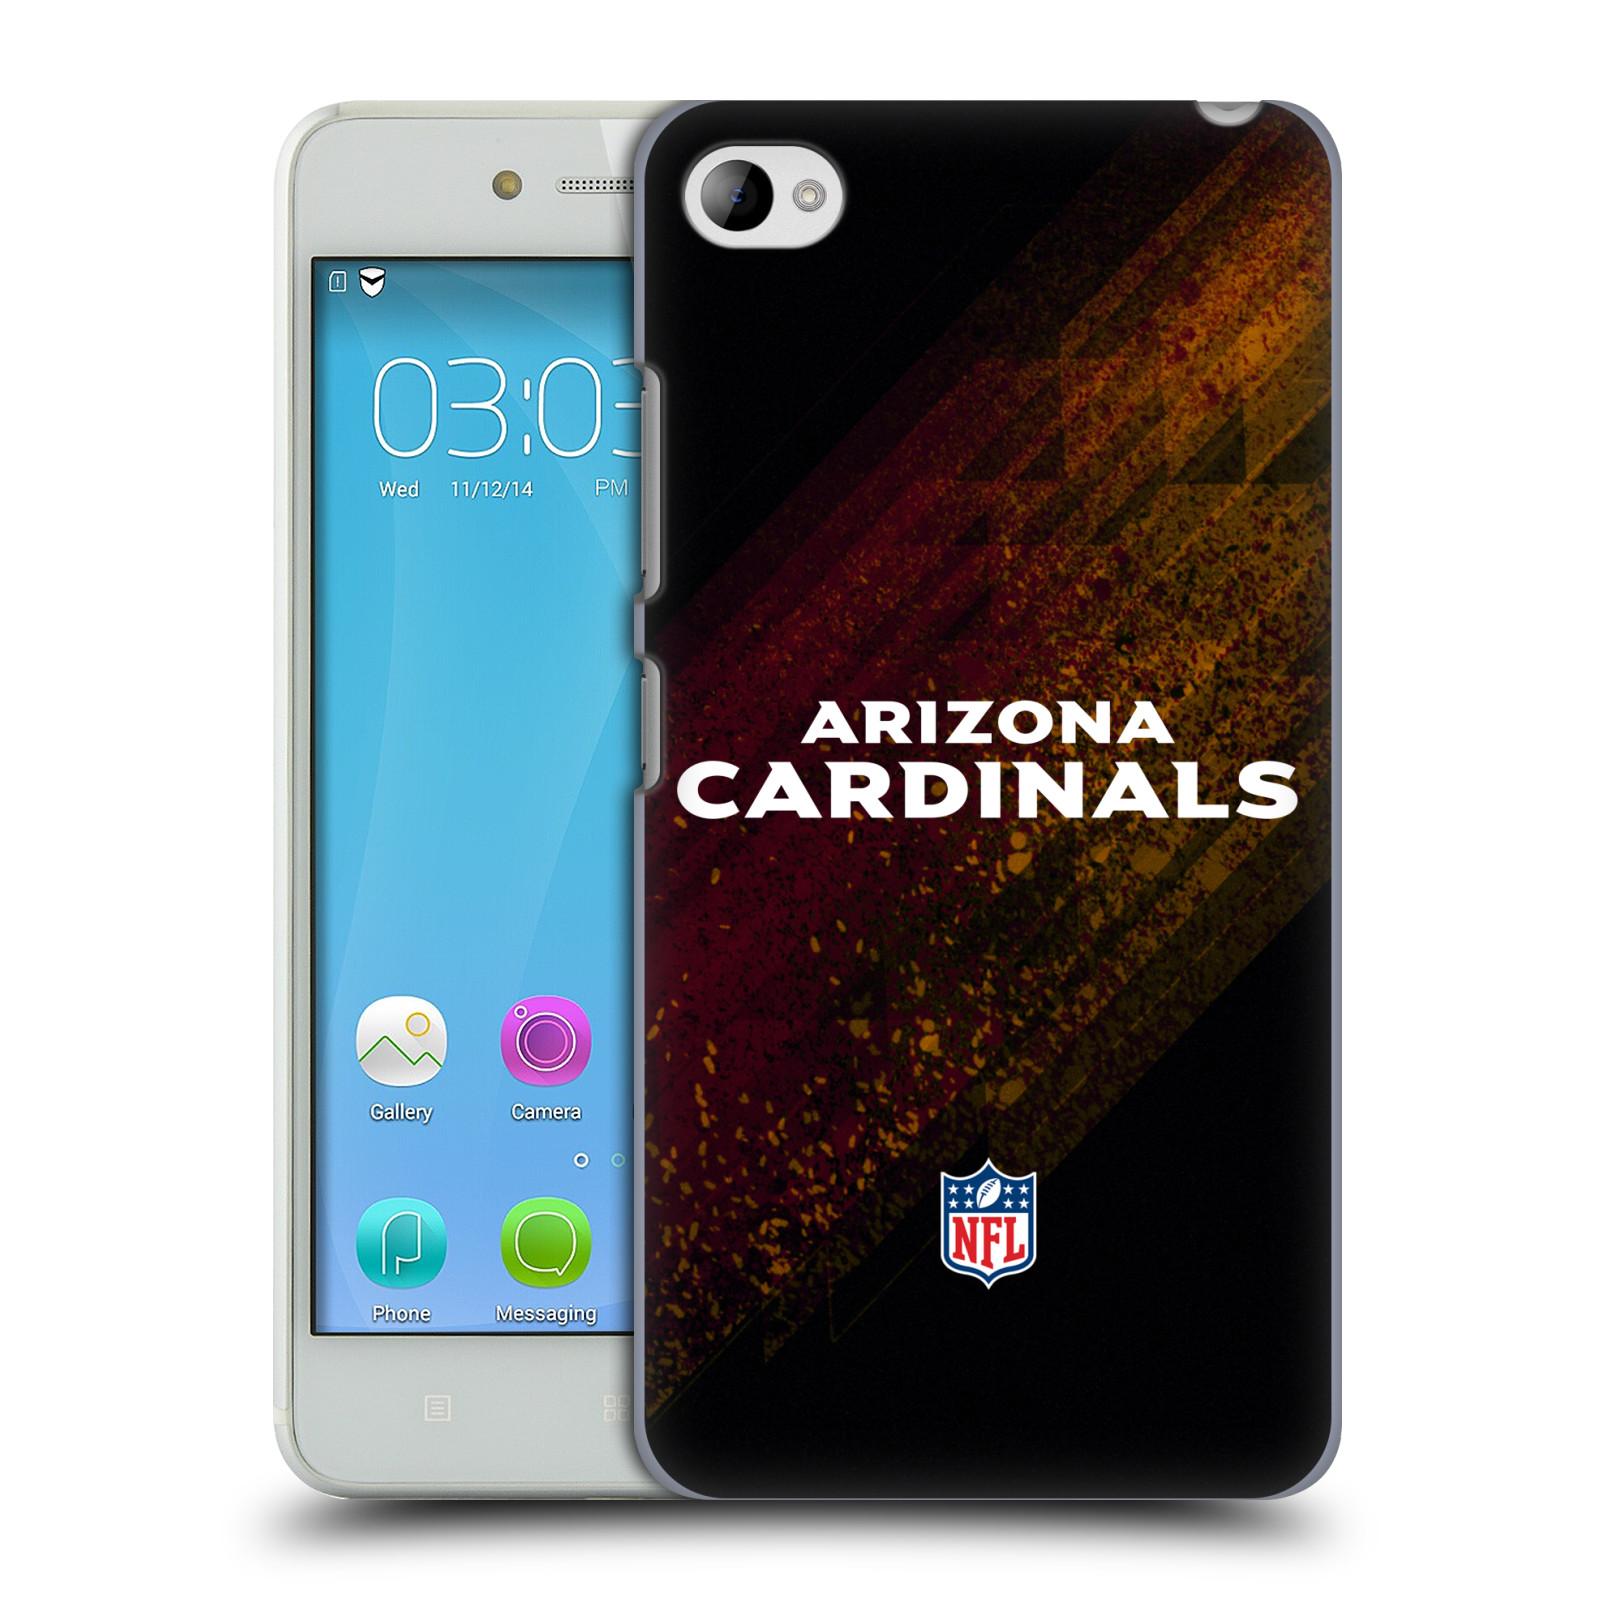 OFFICIAL NFL ARIZONA CARDINALS LOGO HARD BACK CASE FOR LENOVO PHONES